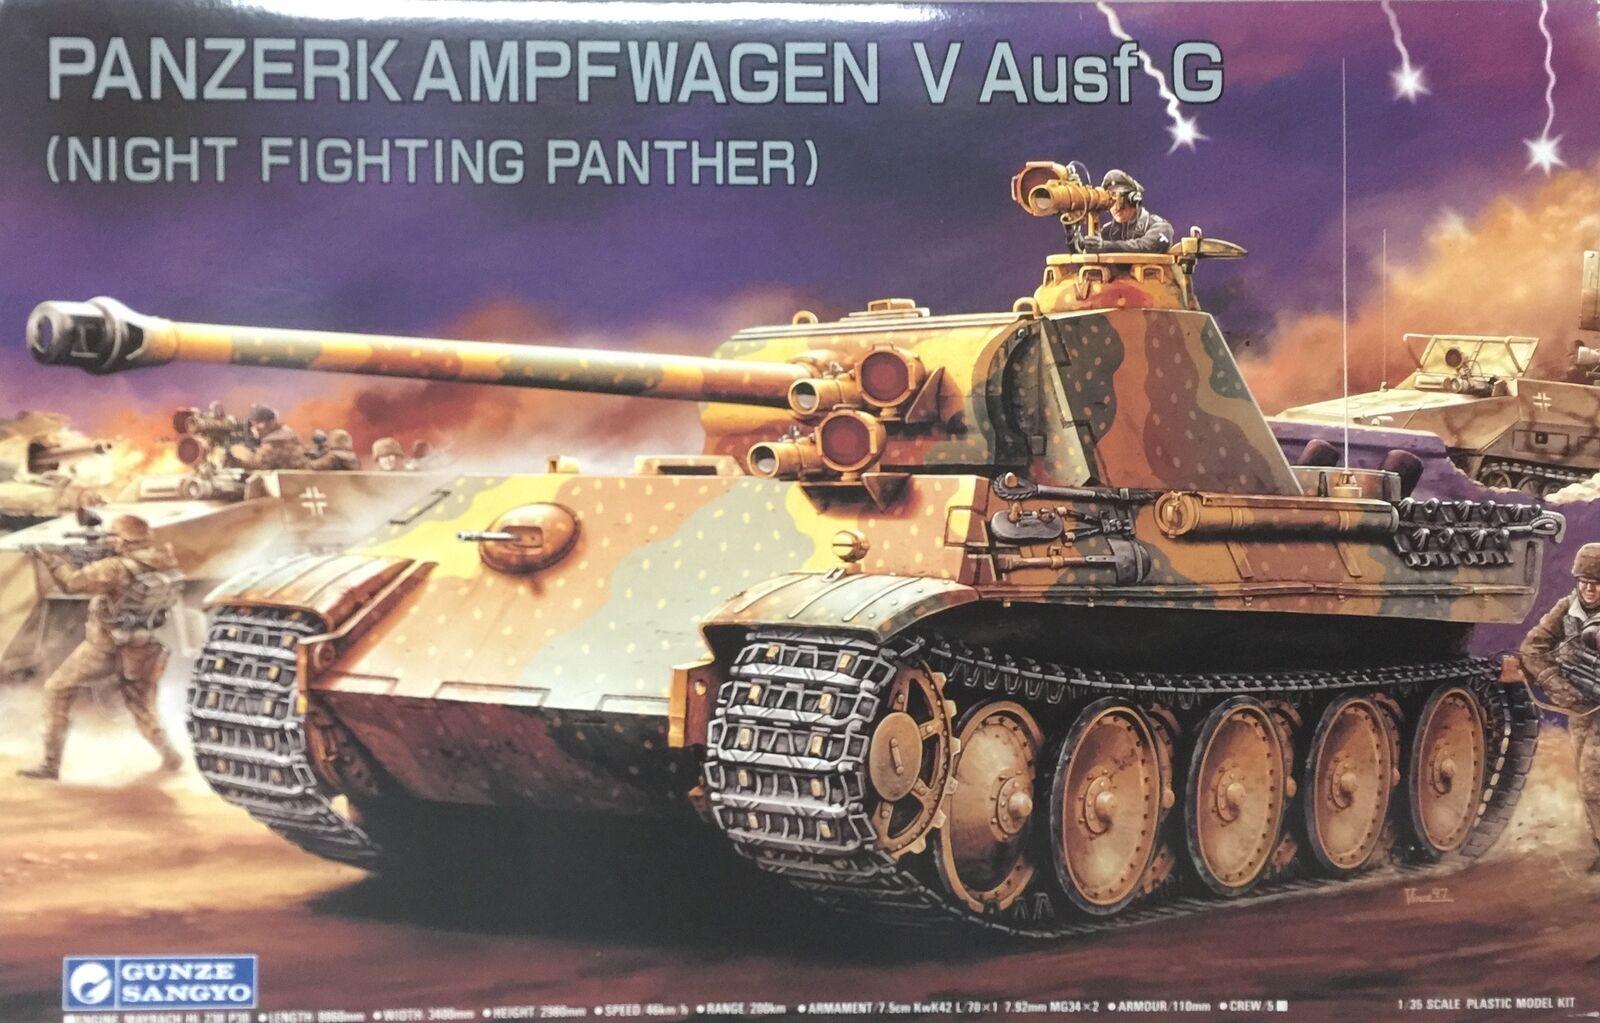 Gunze Sangyo Panzerkampfwagen V Ausf G Night Fighting Panther Ref 782 Escala 1 3